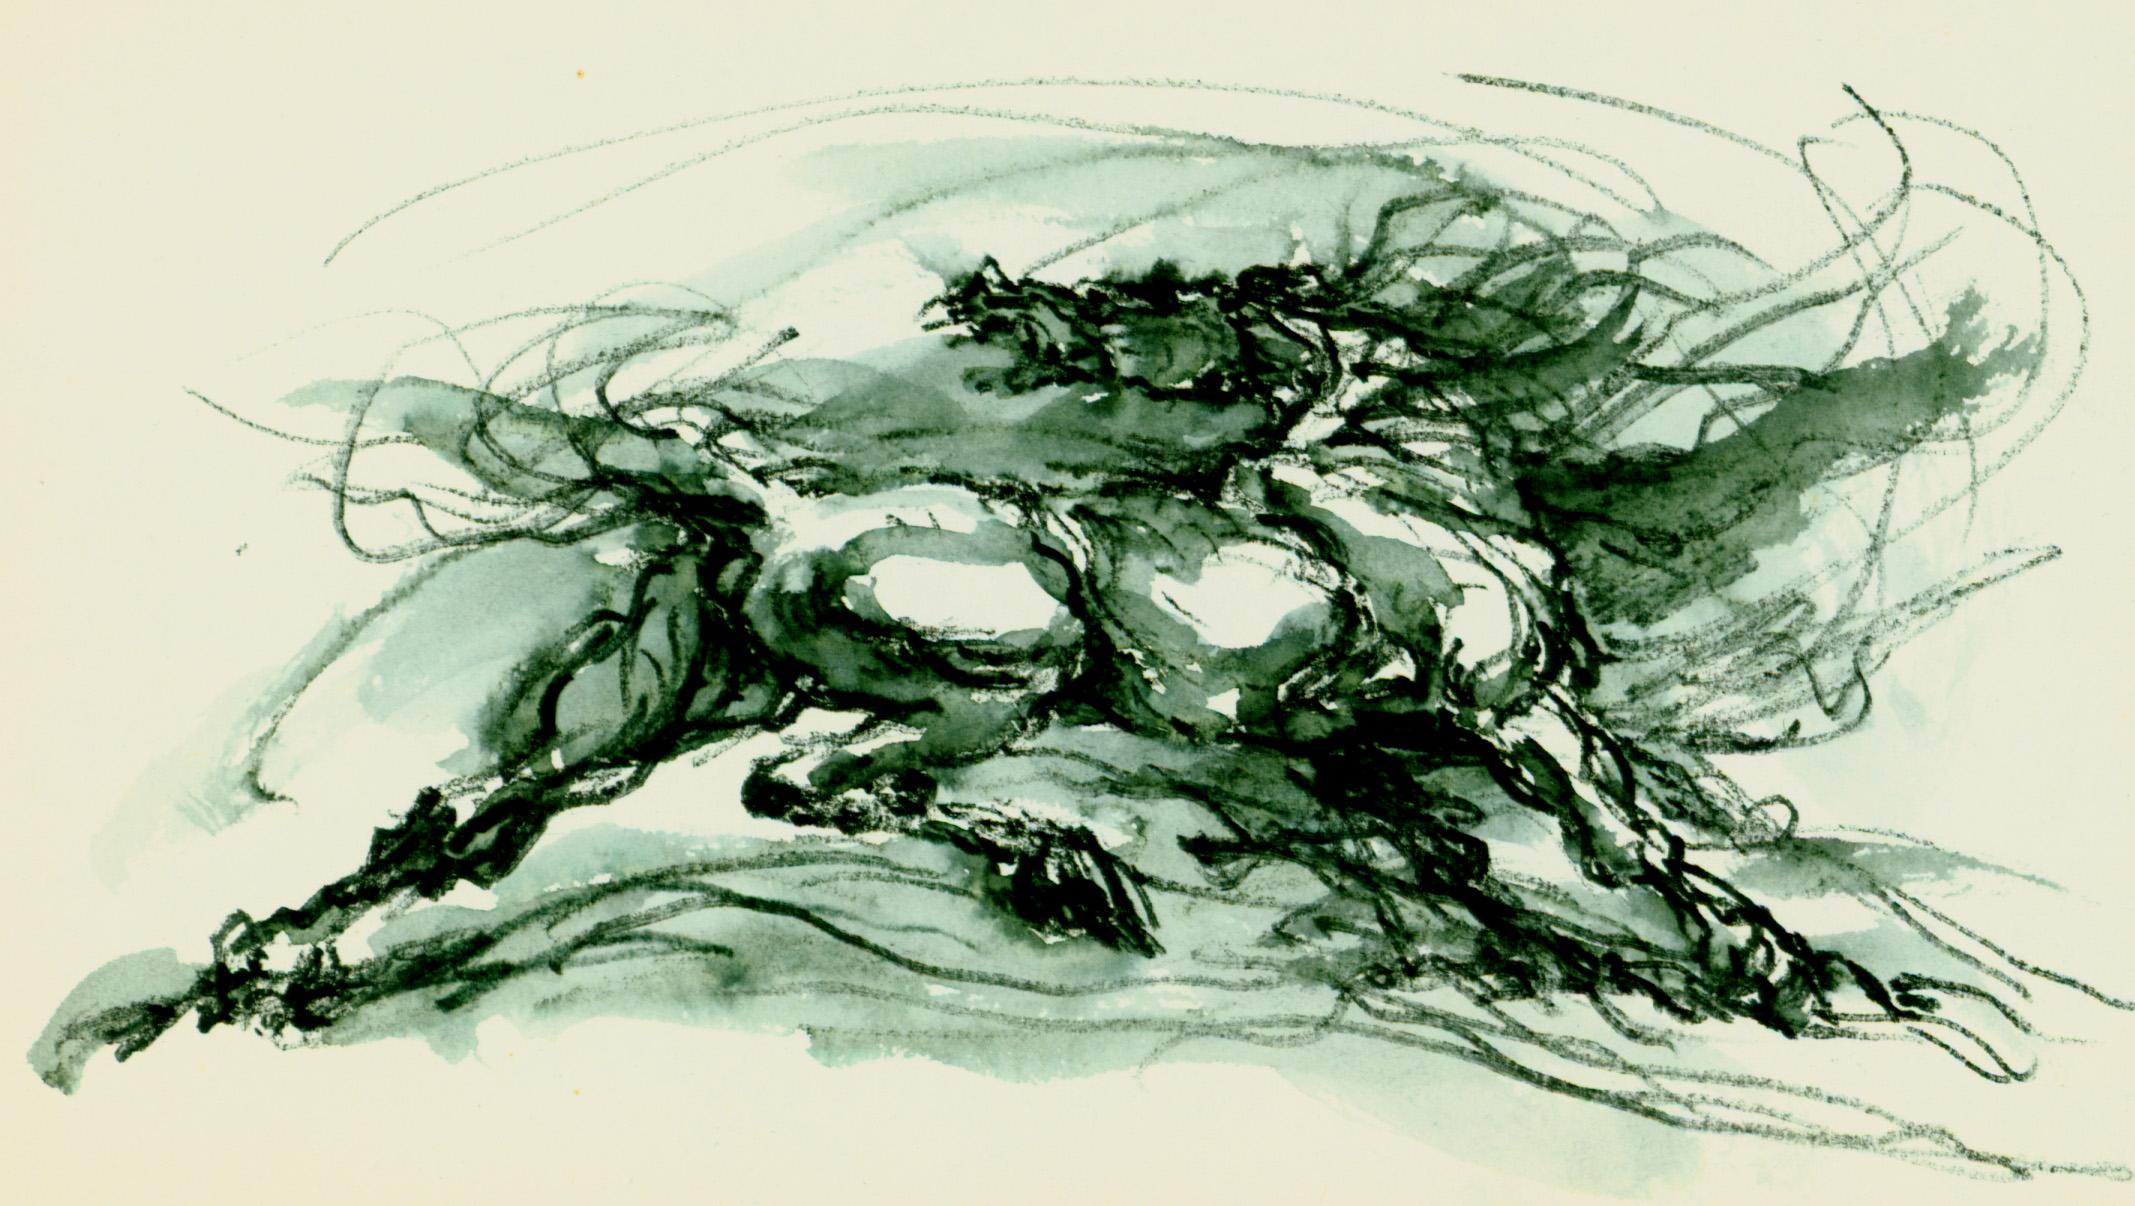 "<font size='3' font color='gray'><p id=""myP"" style=""text-transform:capitalize"">Horse (Pen & ink, wash, 4 x 7) c. 1980's</p>"